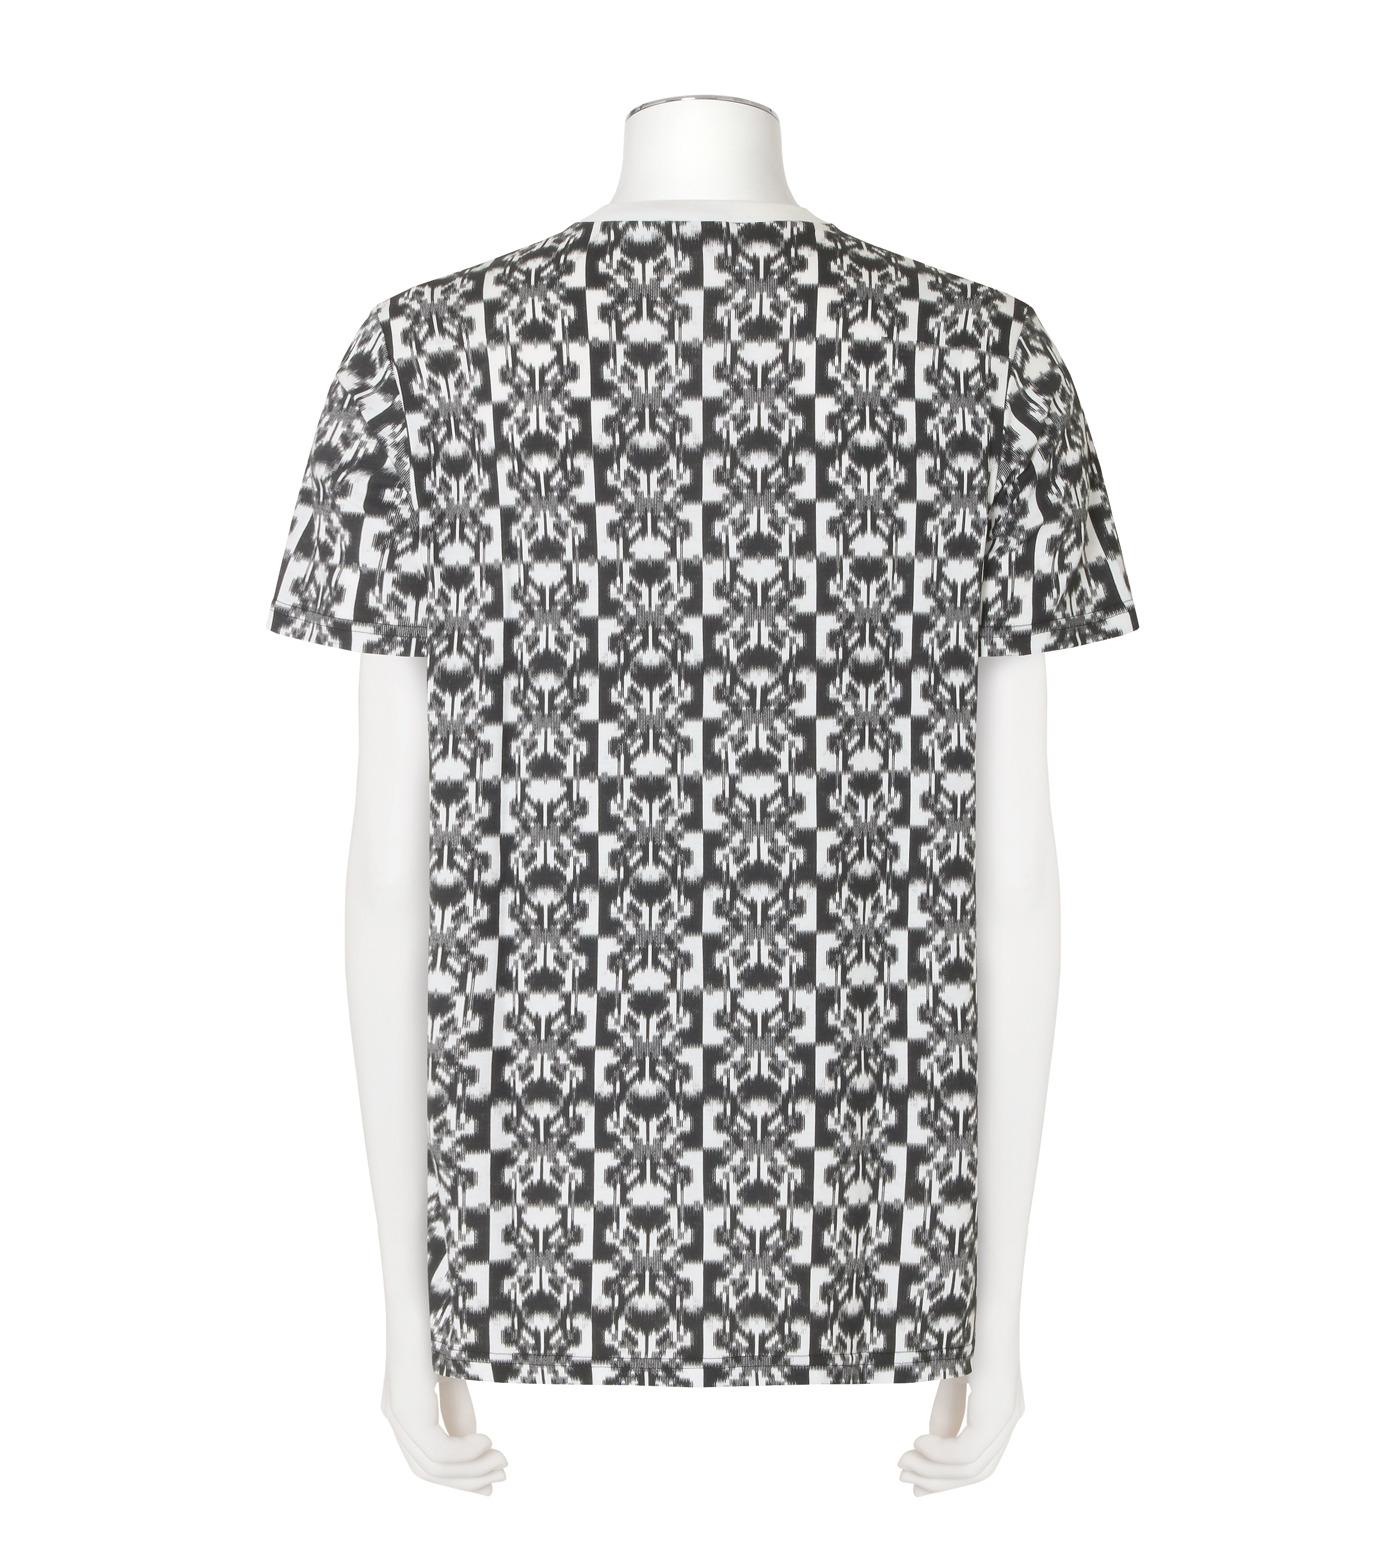 Dior Homme(ディオール オム)のPattern T-WHITE(カットソー/cut and sewn)-633J654I0111-4 拡大詳細画像2